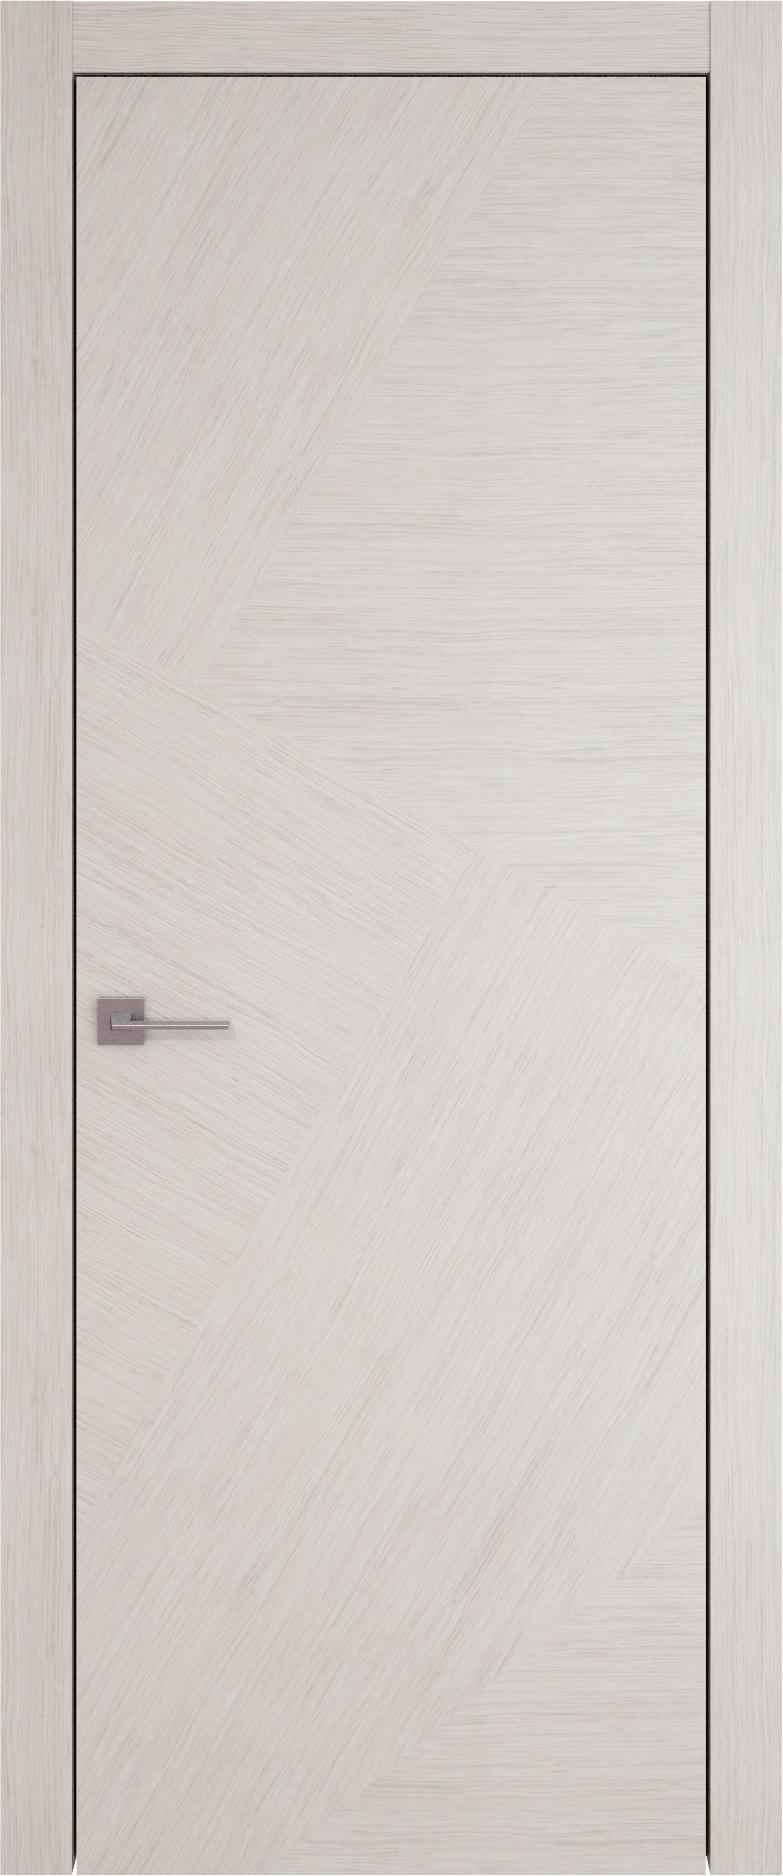 Tivoli М-1 цвет - Дымчатый дуб Без стекла (ДГ)